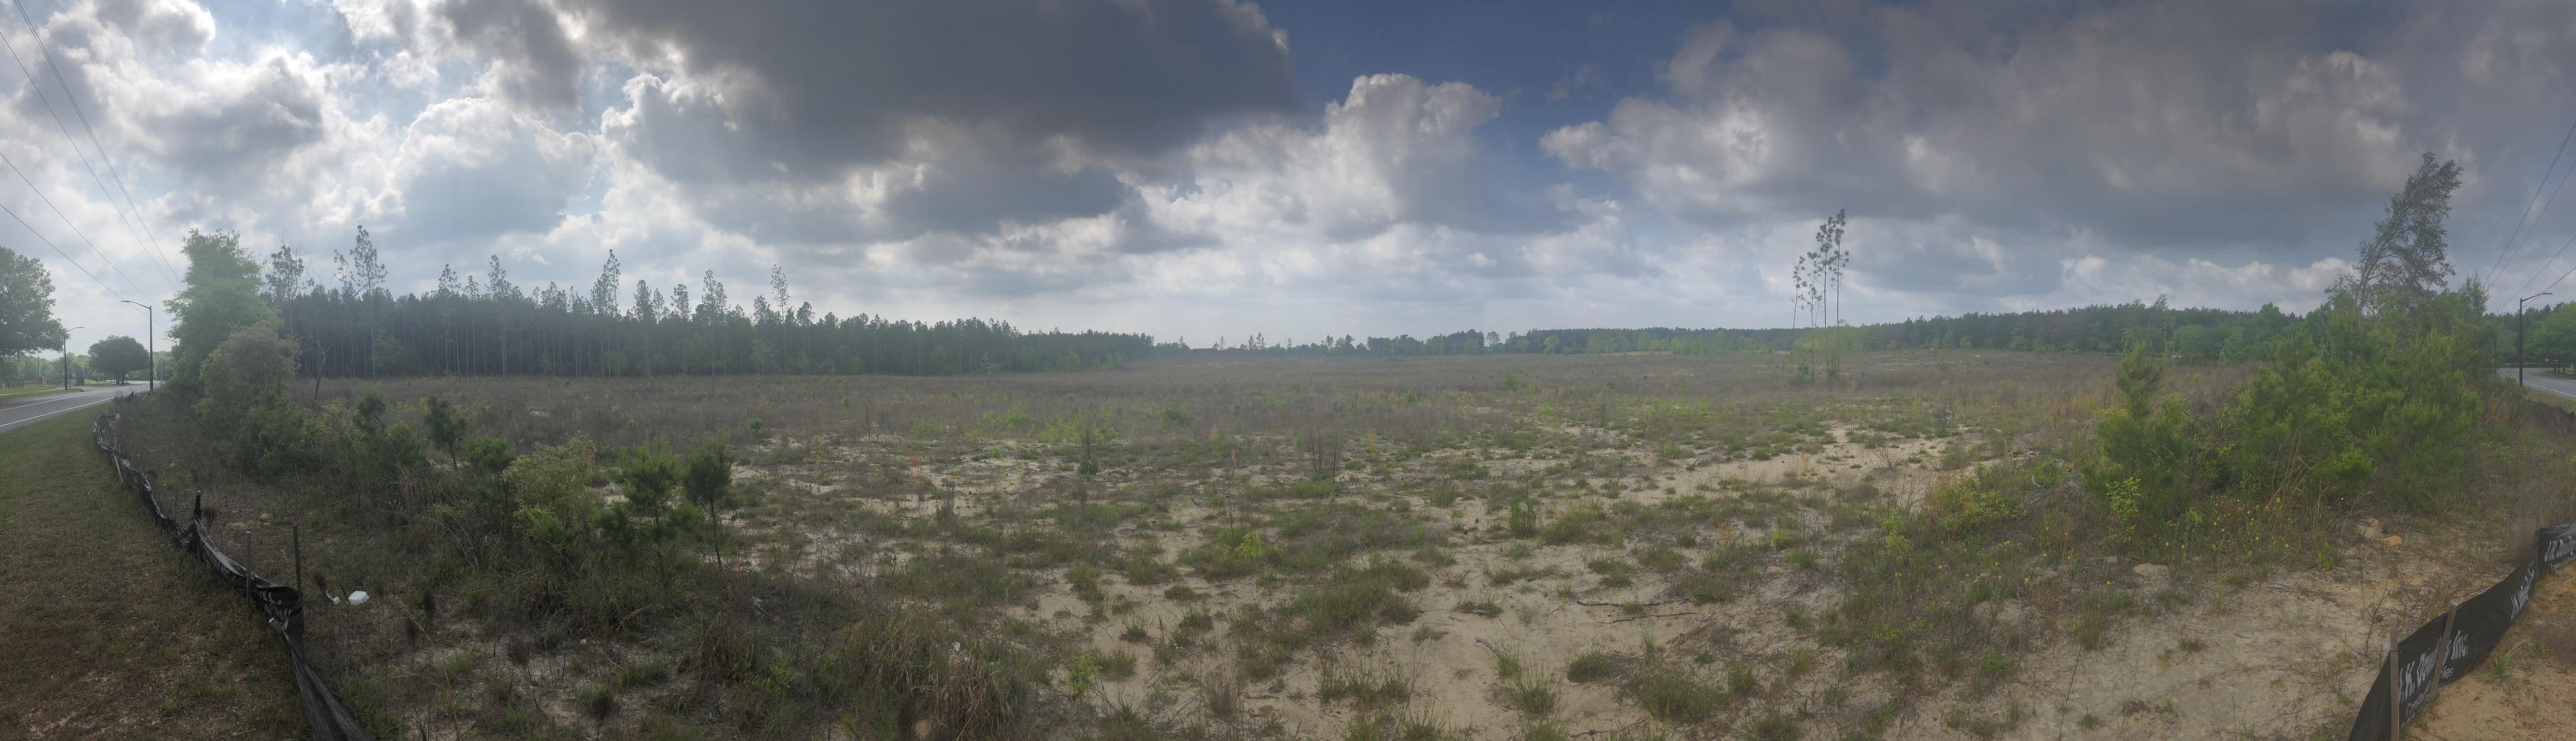 sandy scrubland